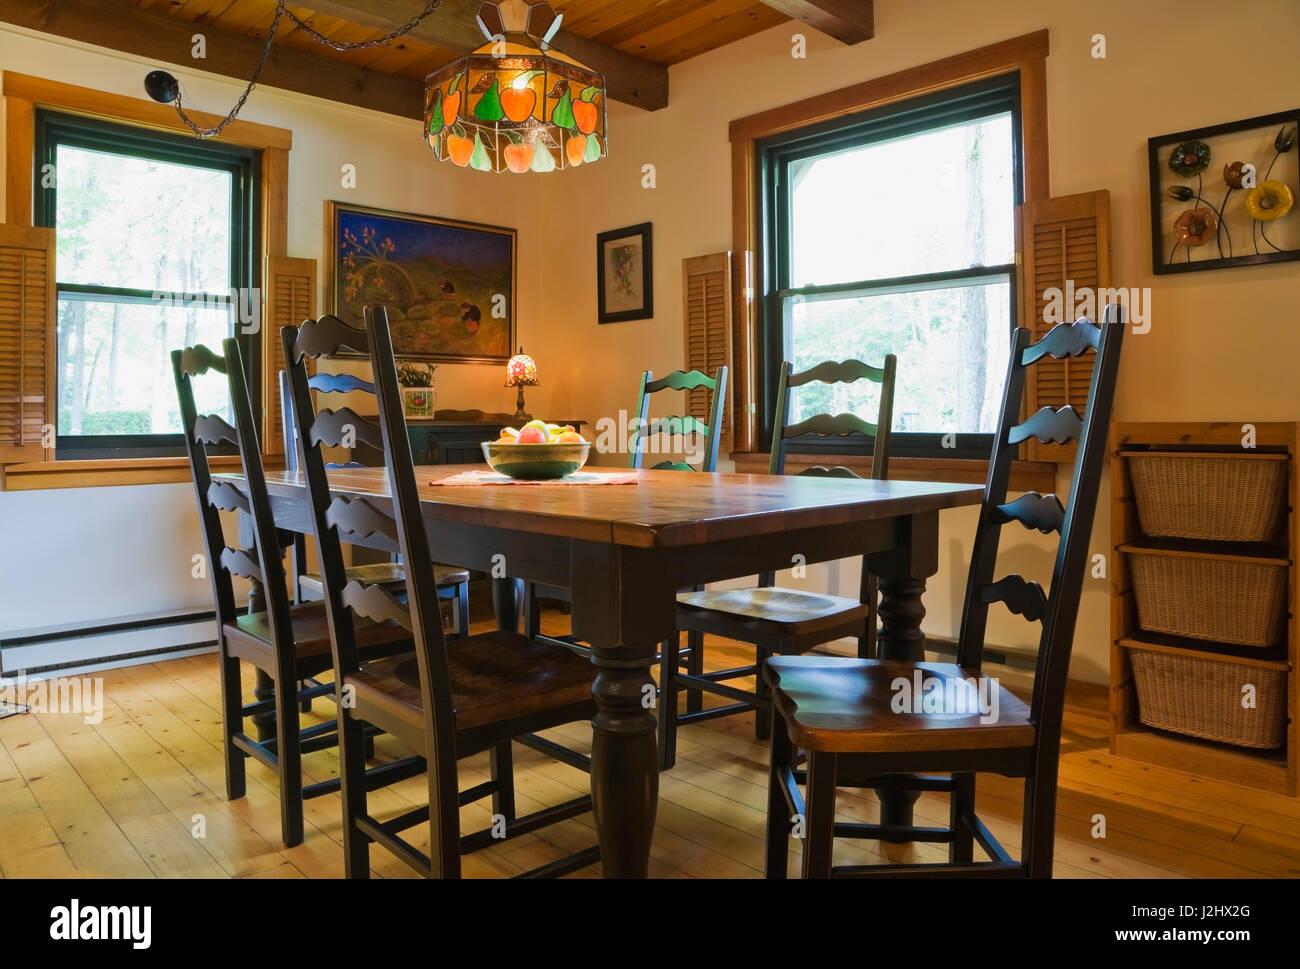 Tavoli Sala Da Pranzo In Legno : Sala da pranzo con uno stile antico tavolo da pranzo in legno e